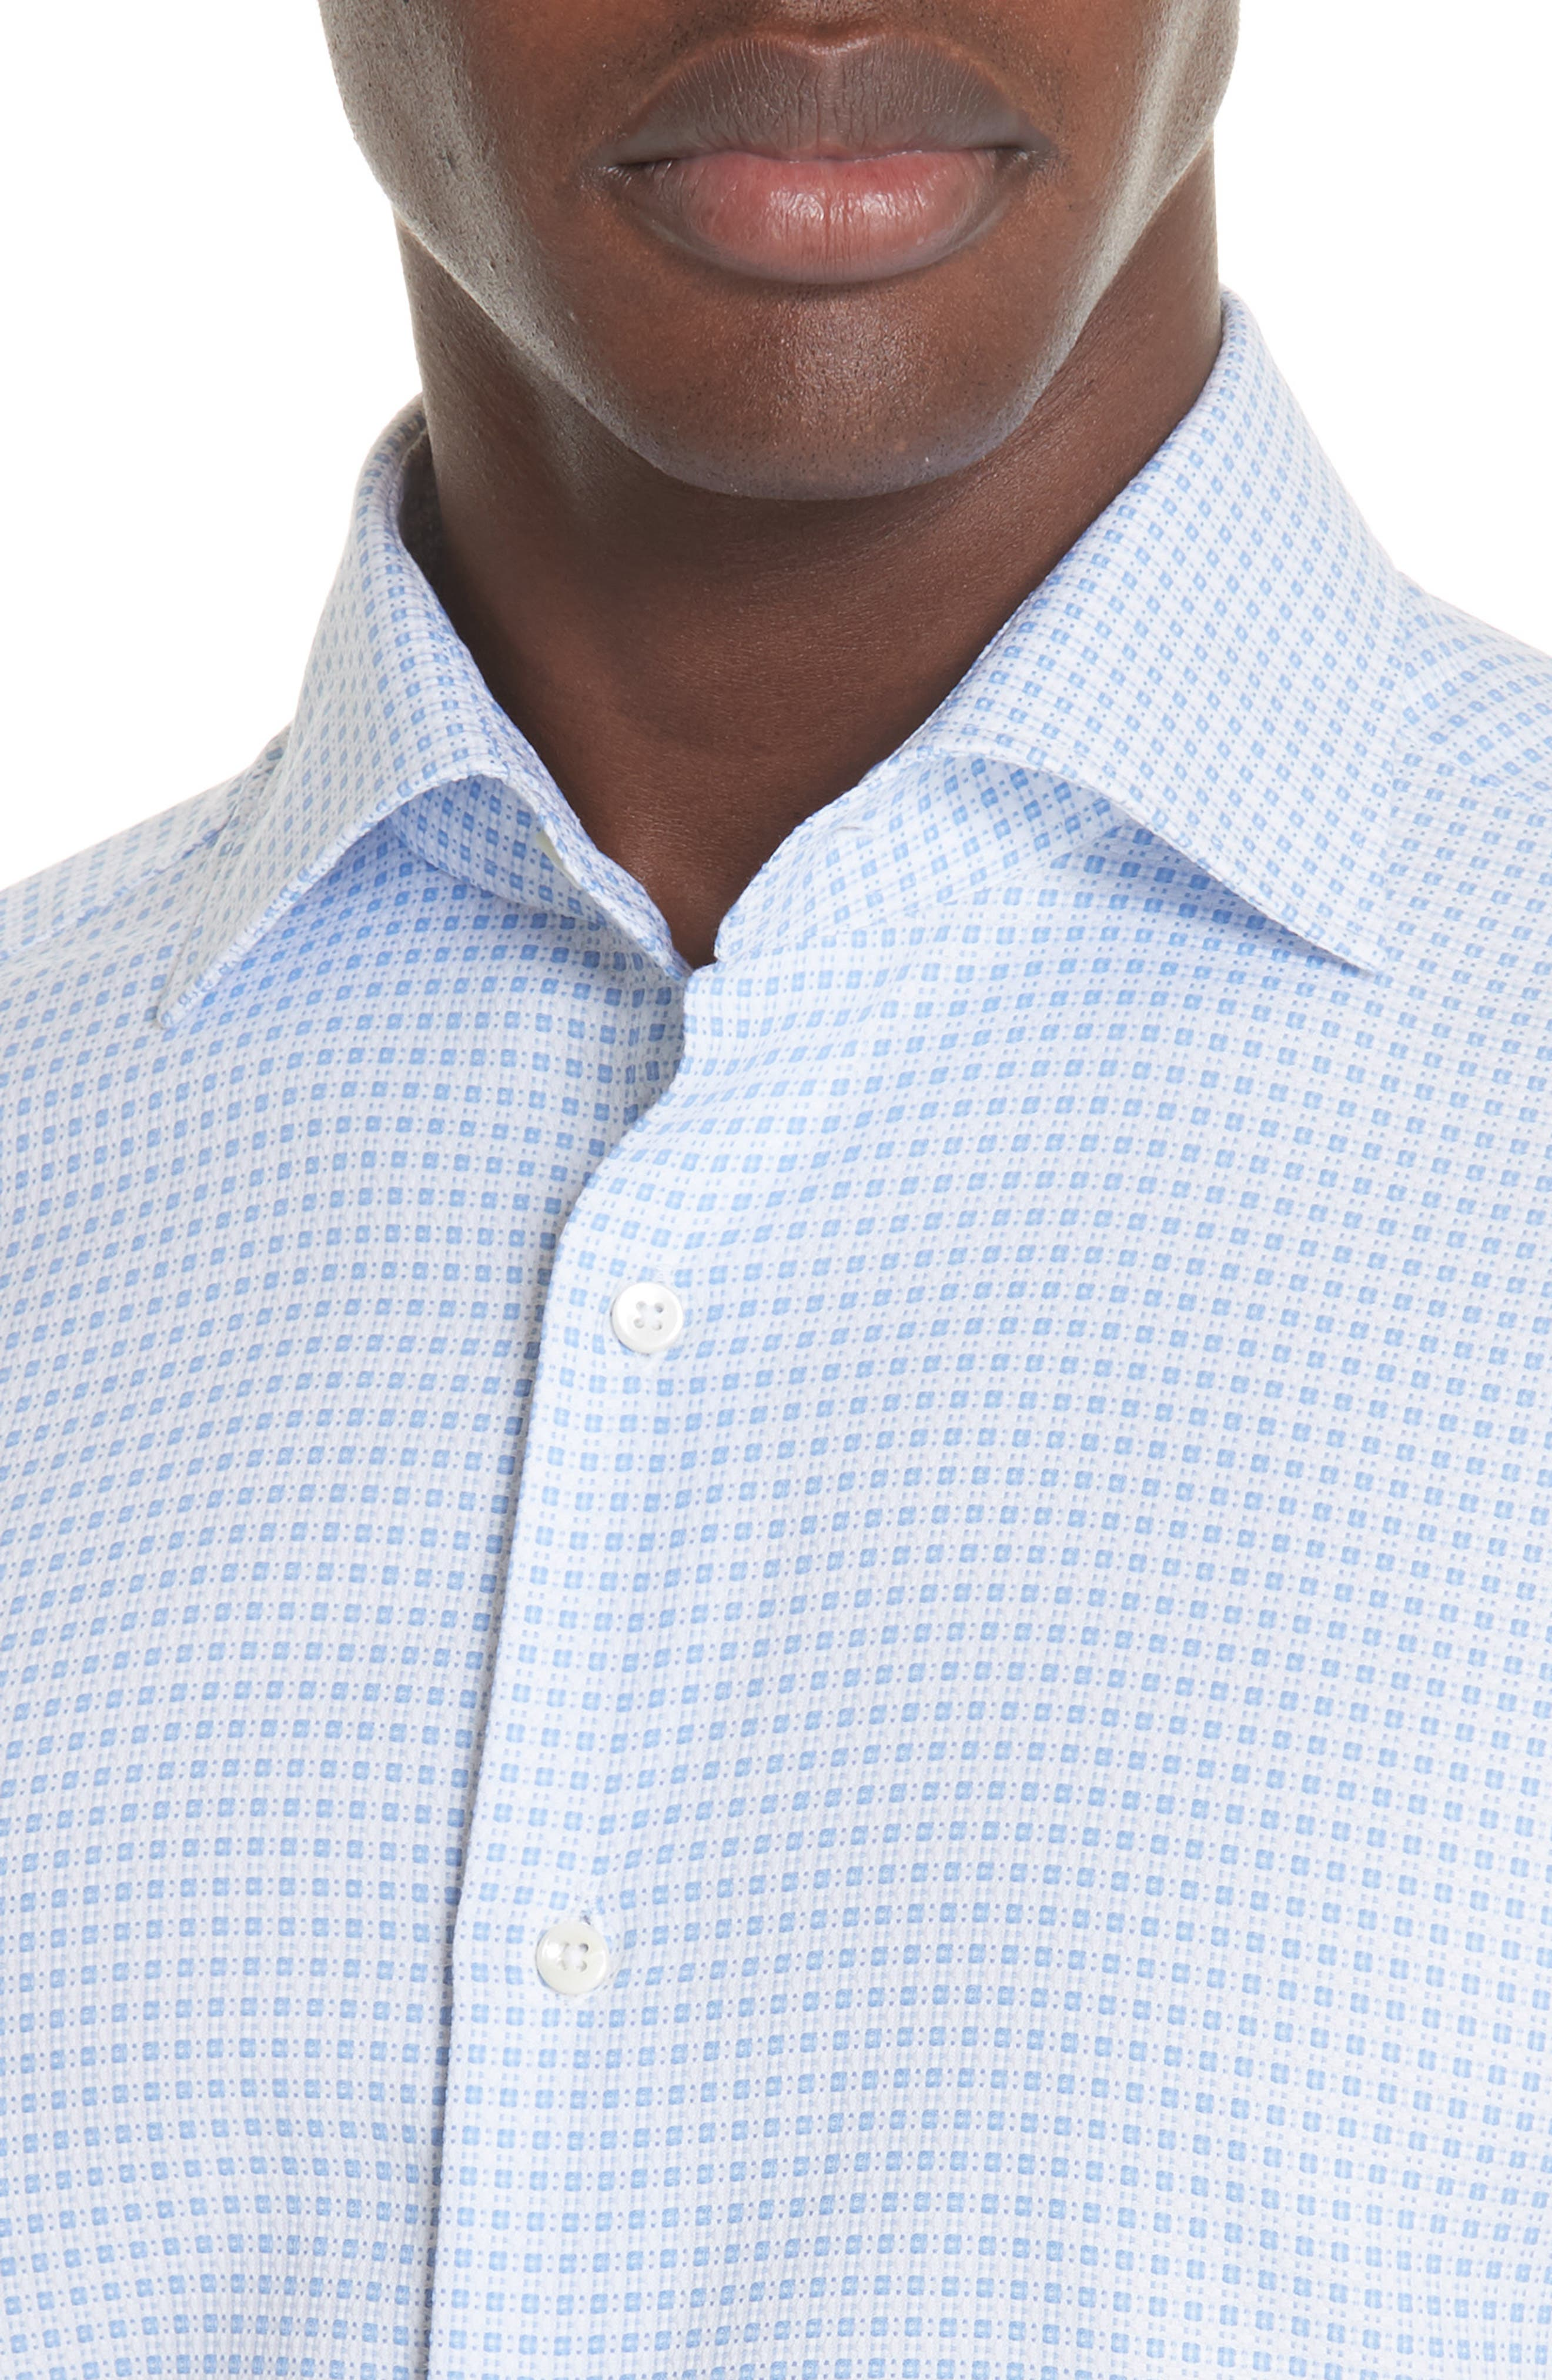 Trim Fit Check Dress Shirt,                             Alternate thumbnail 2, color,                             BRIGHT BLUE